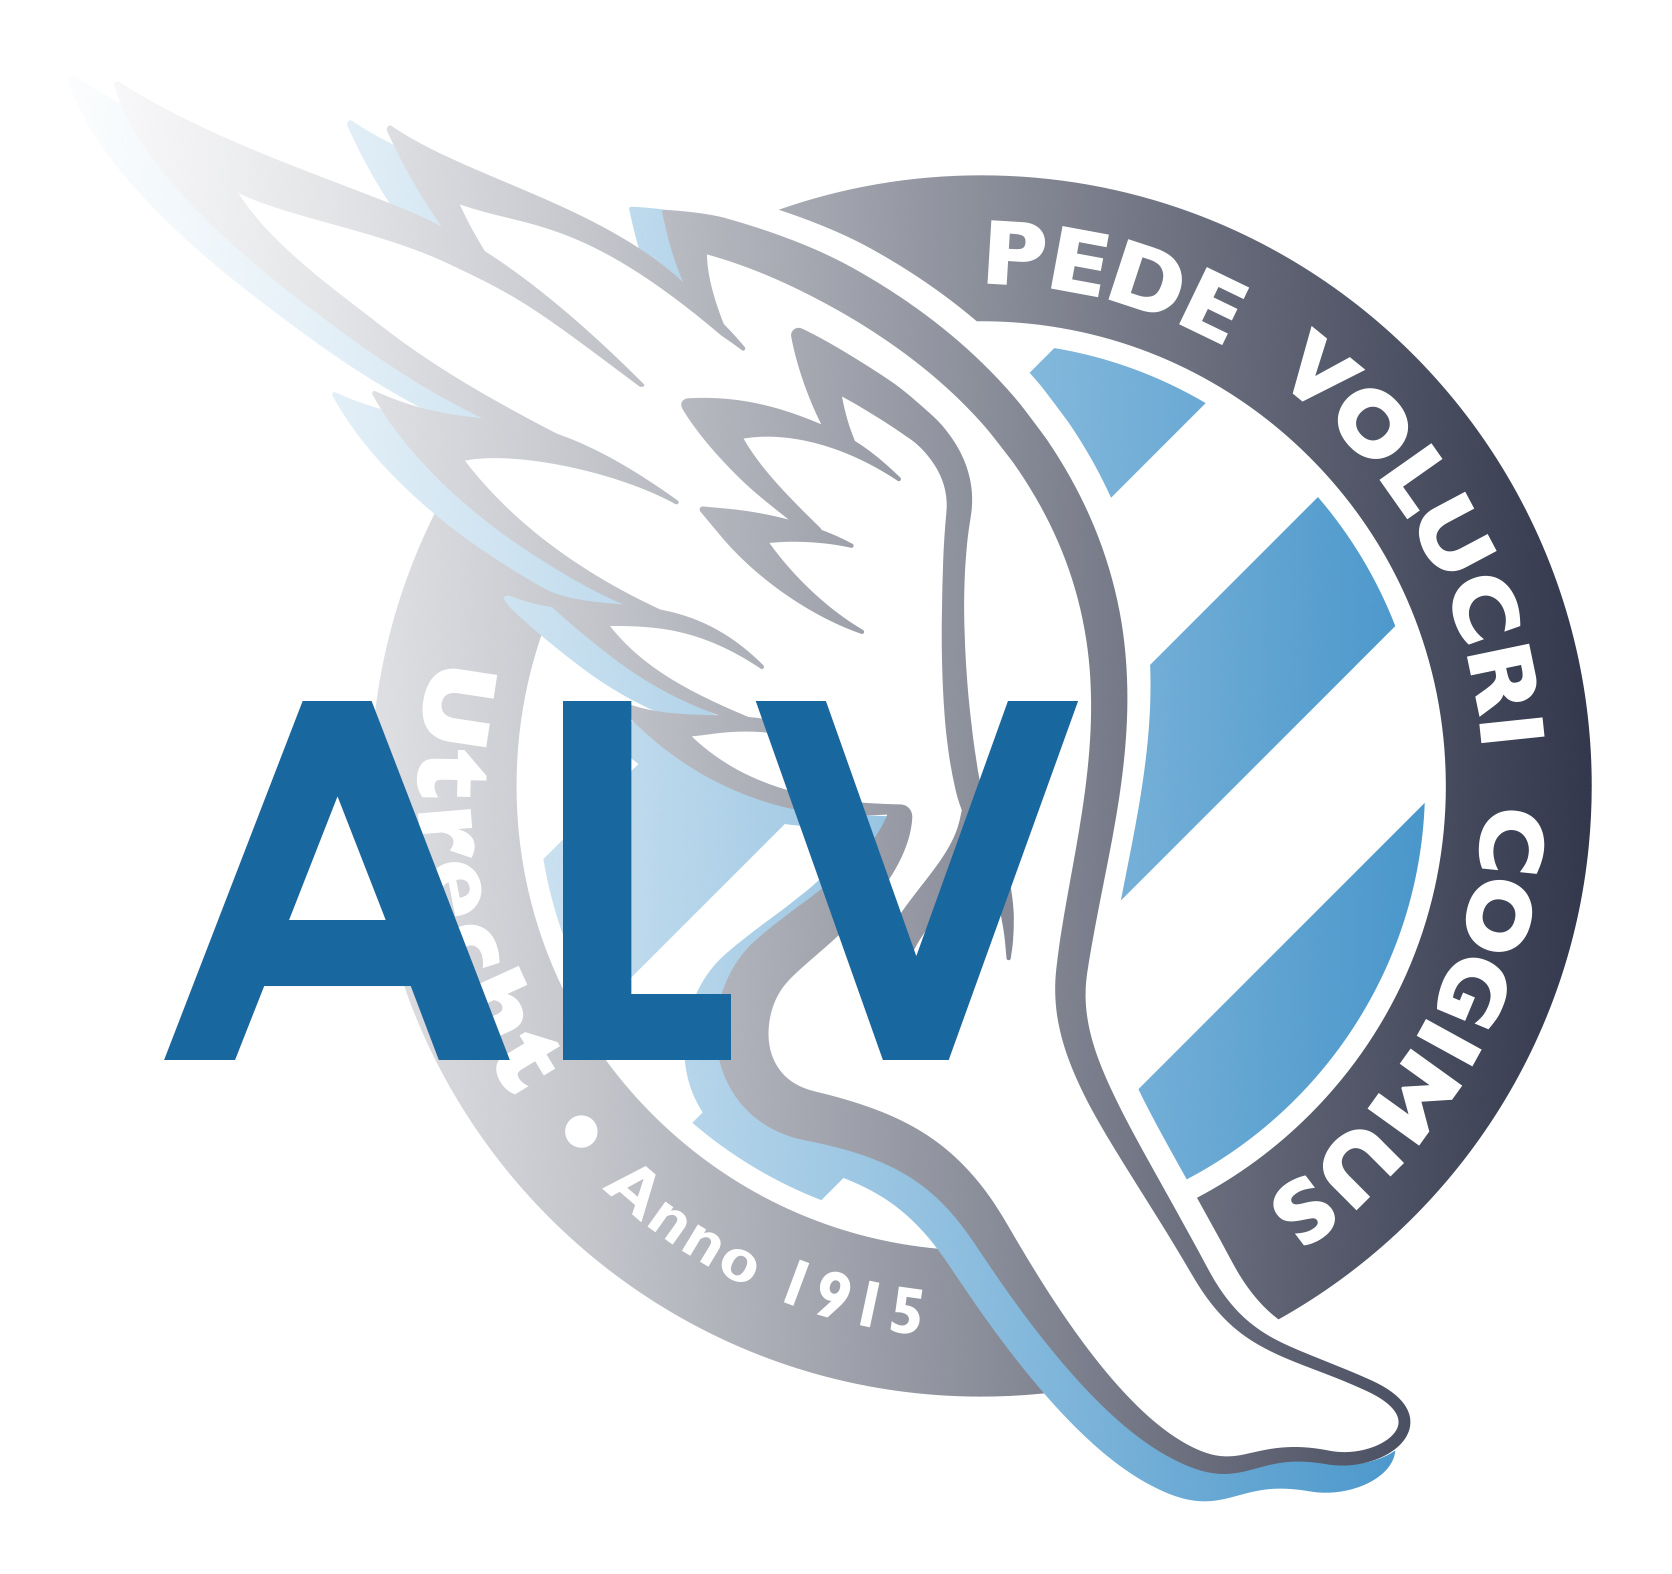 ALV 2020 op 30 november